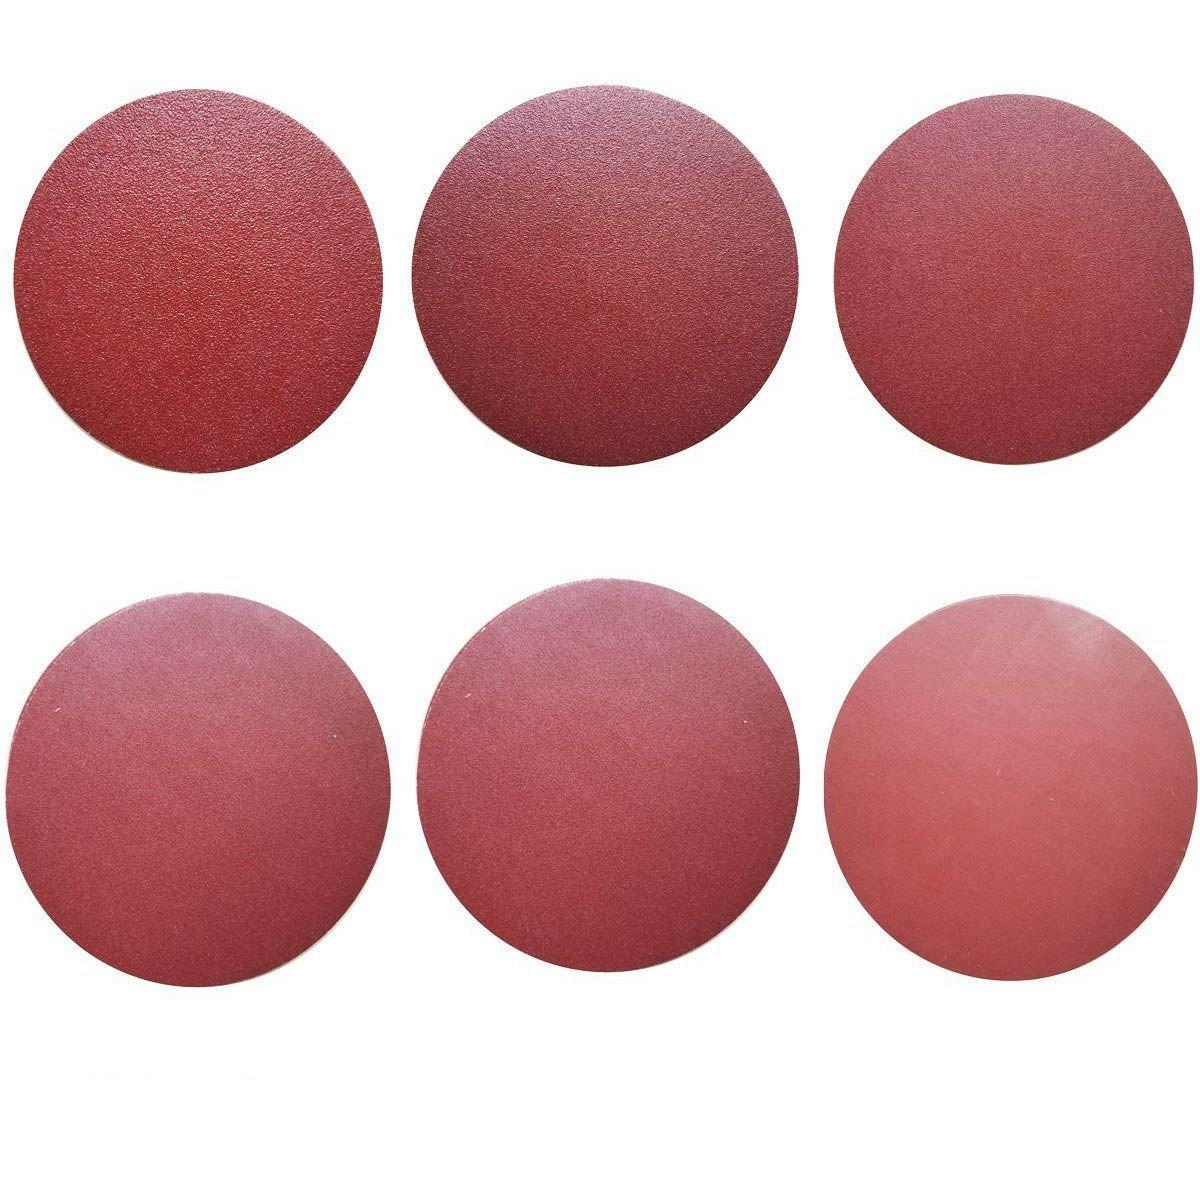 SODIAL 60 PCS 6-Inch NO-Hole Aluminum Oxide Sanding Disc Self Stick(10 Each of 80 100 120 180 240 400)